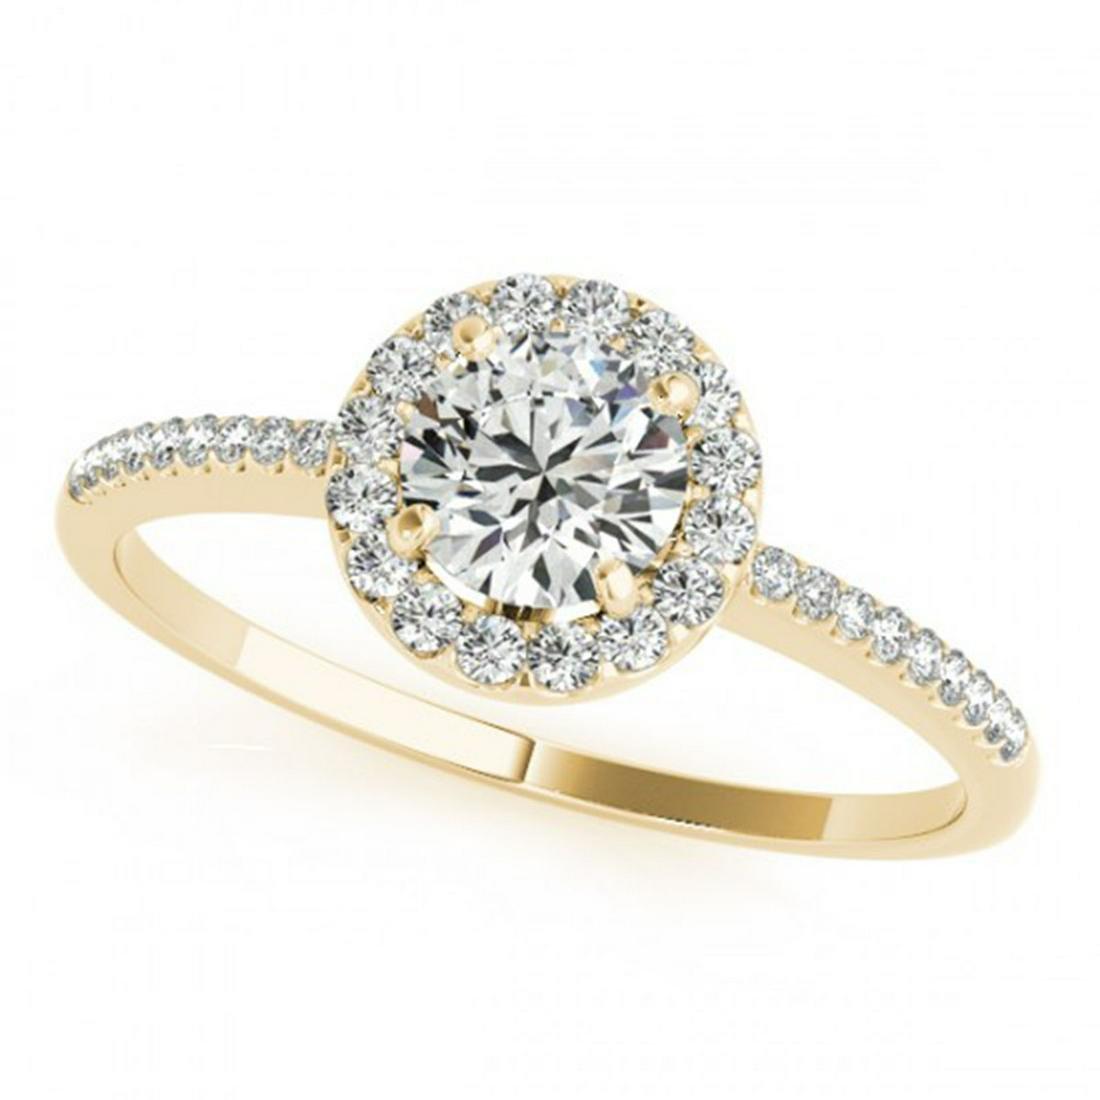 0.75 ctw VS/SI Diamond Halo Ring 14K Yellow Gold